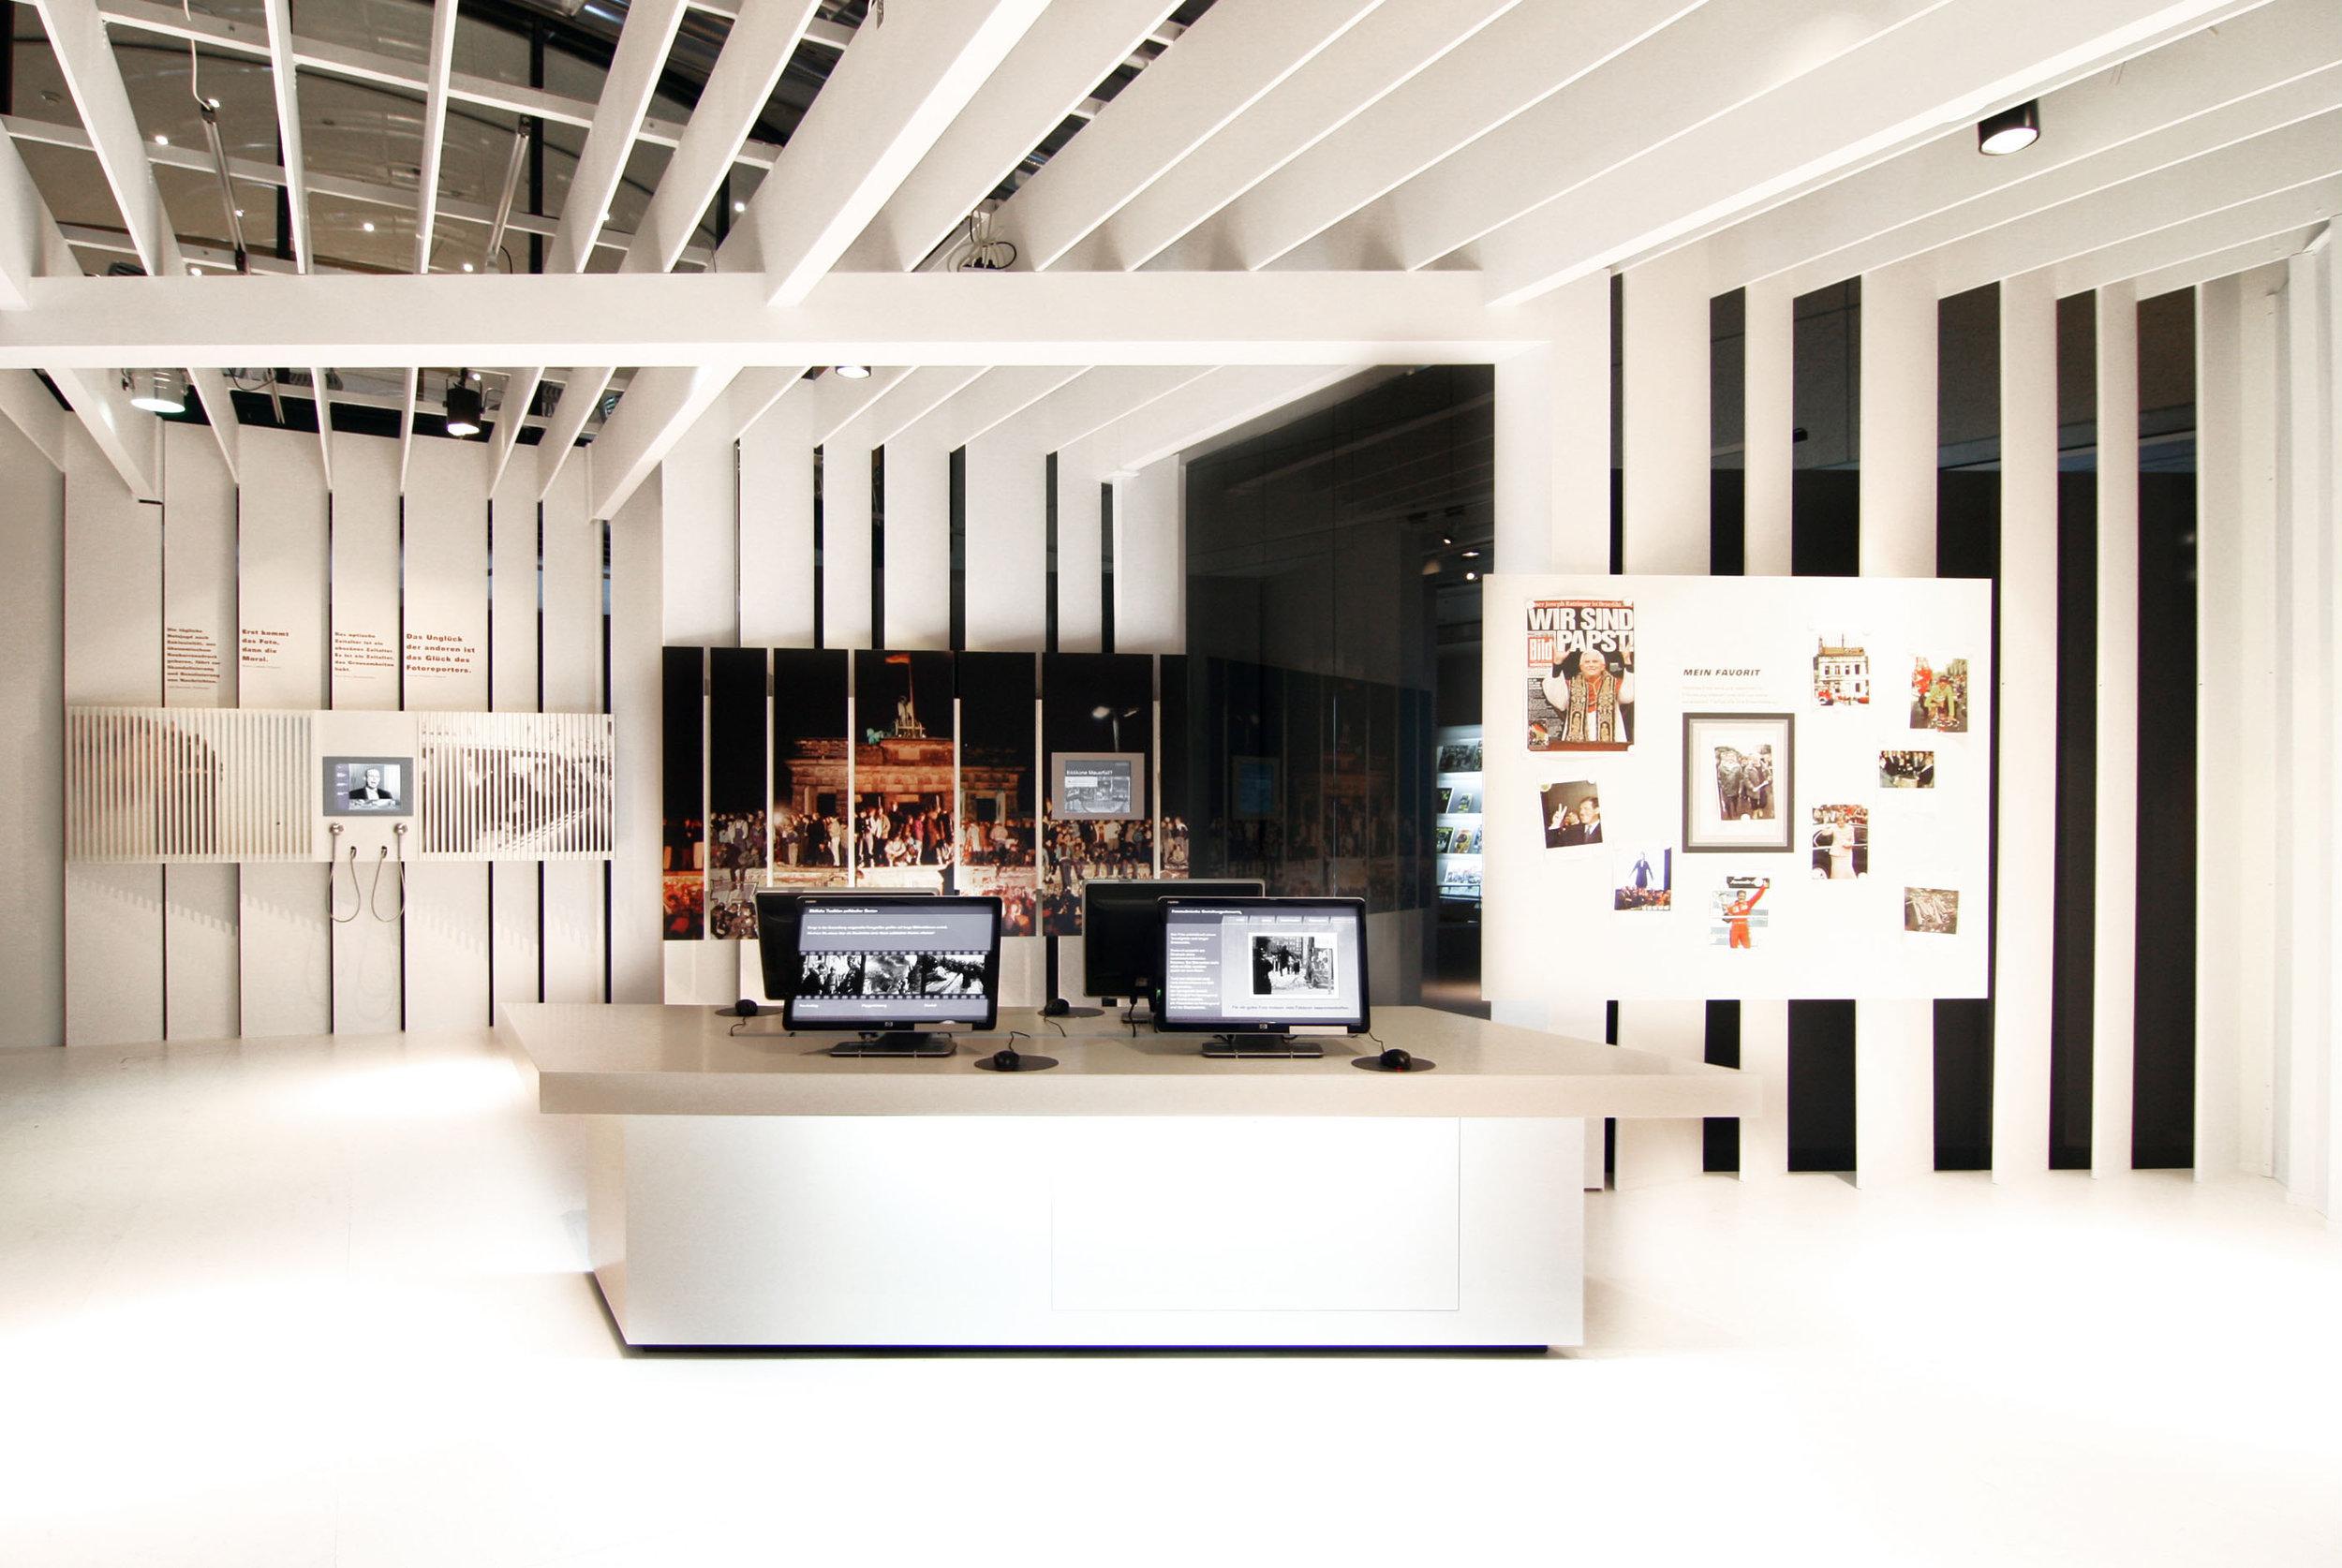 bilder-im-kopf_museum-exhibition-design_coordination-berlin_03.jpg